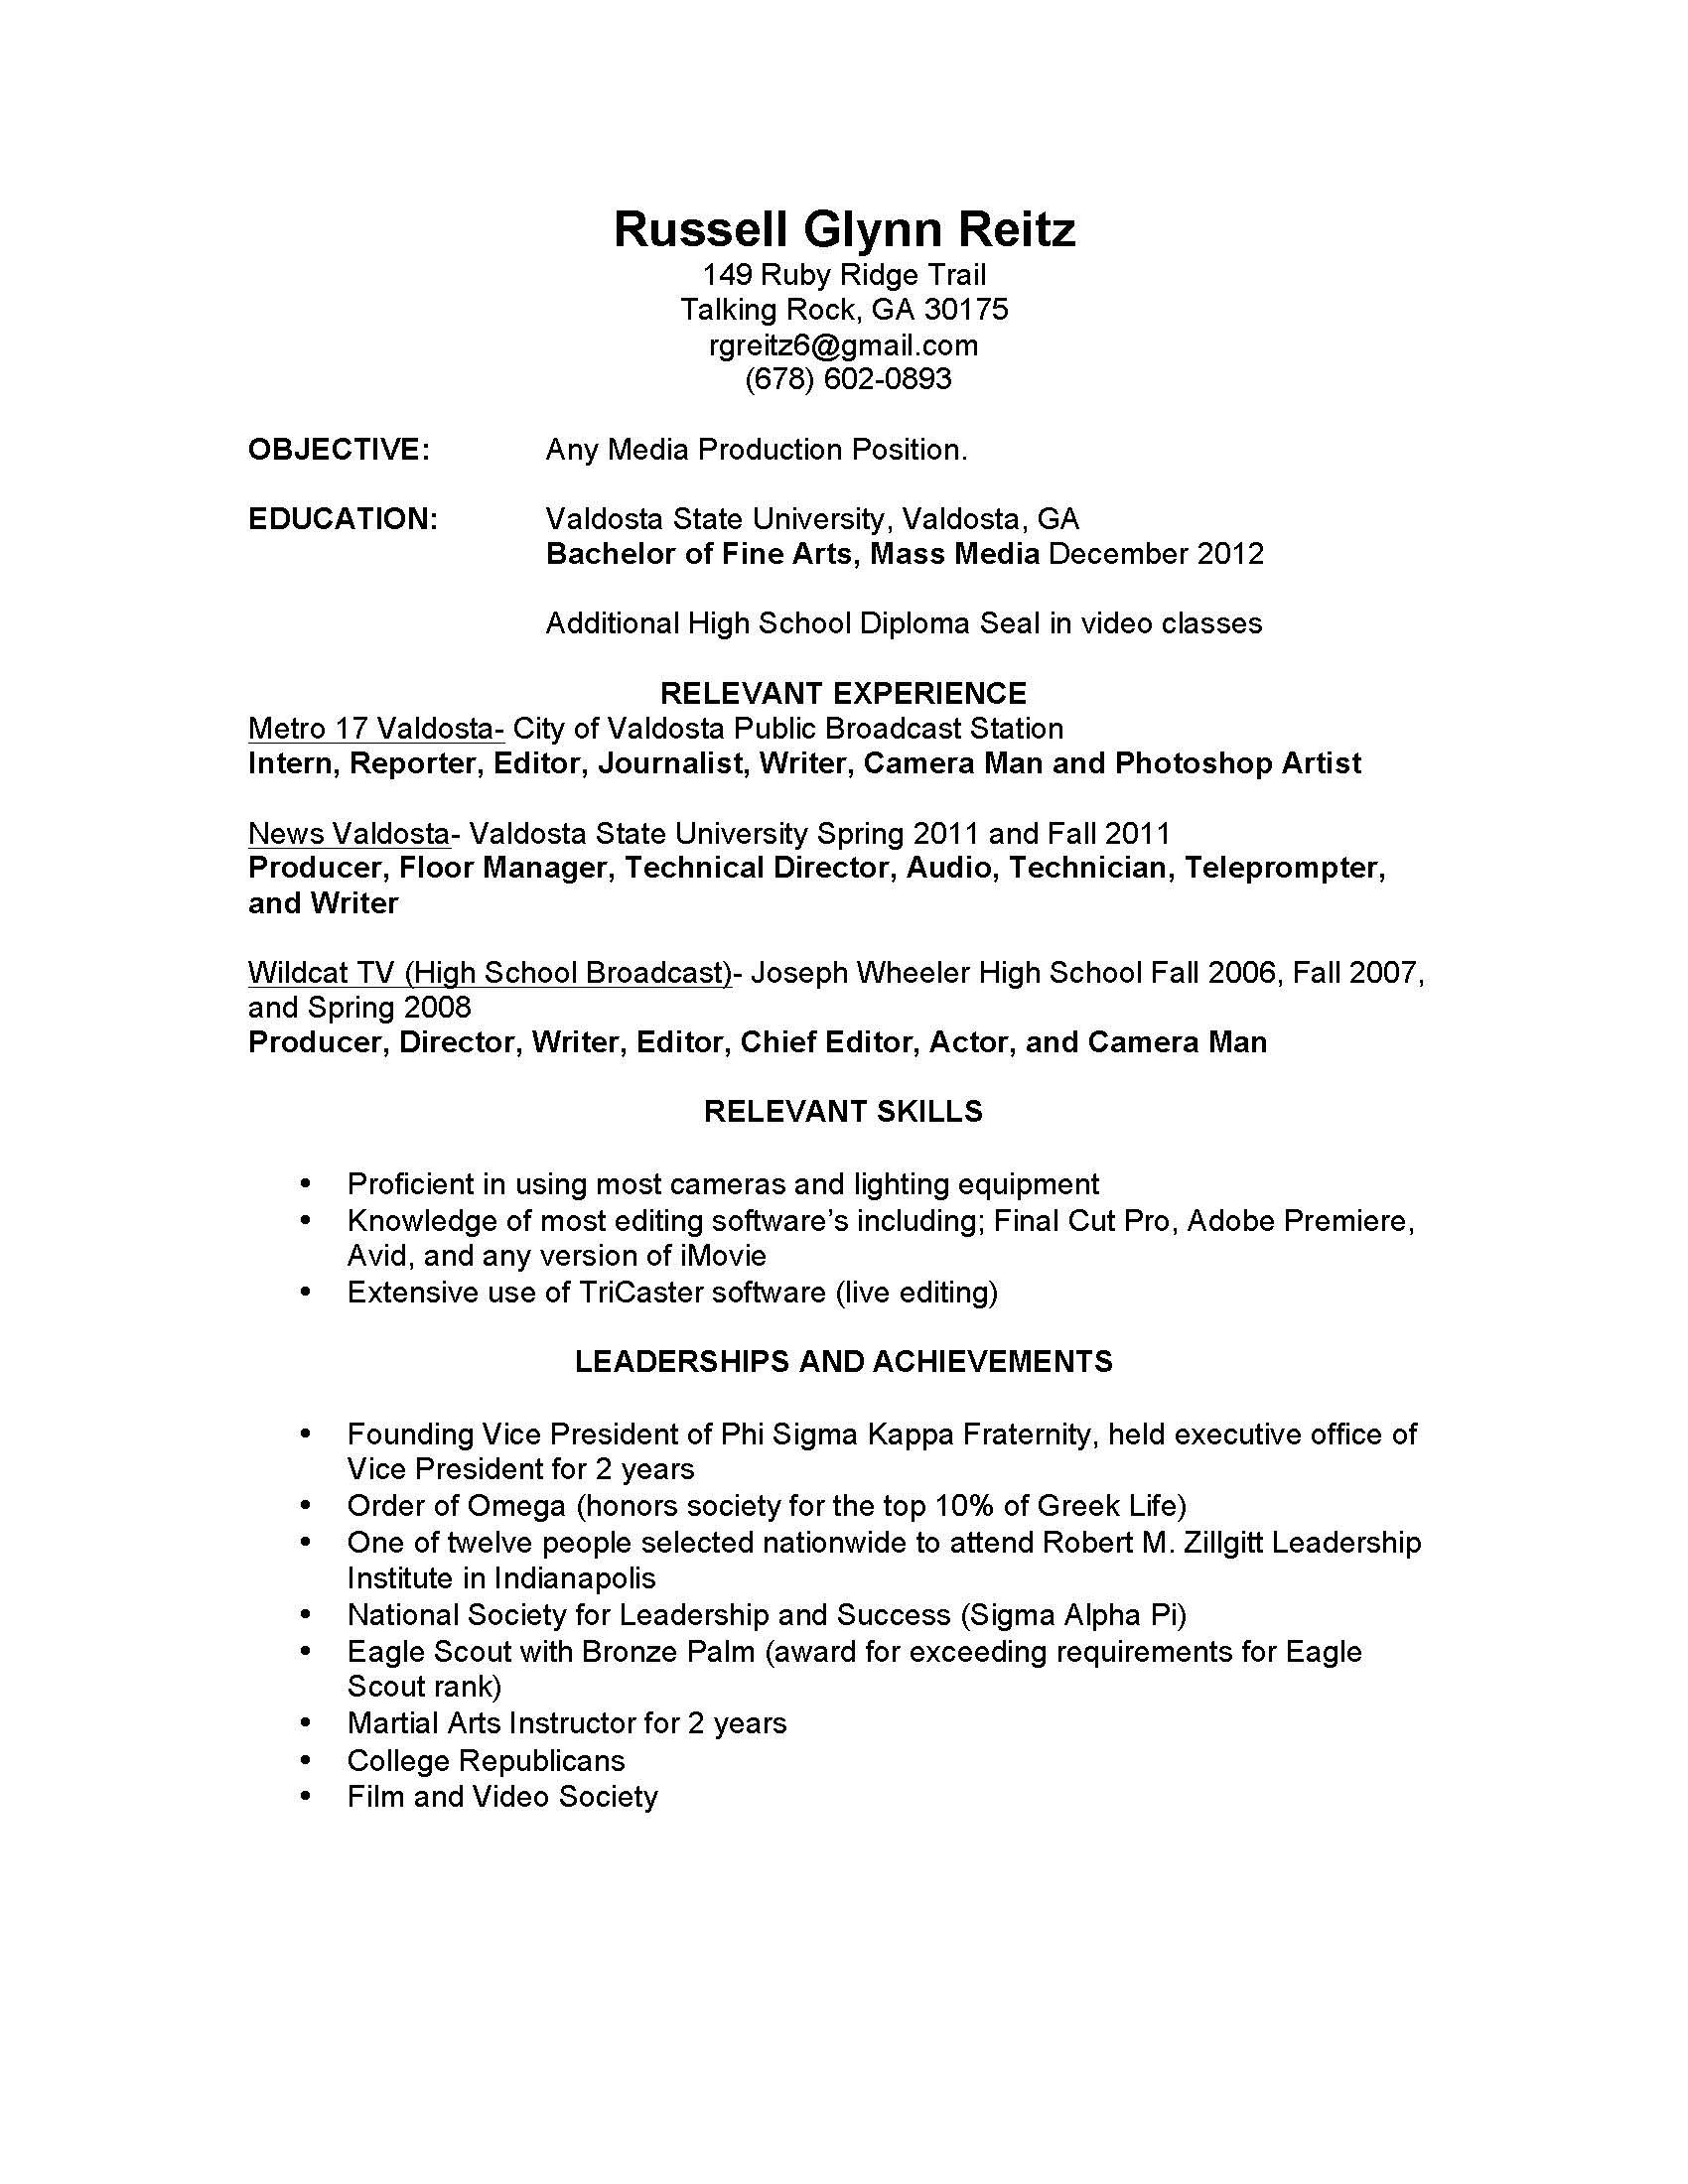 news videographer sample resume